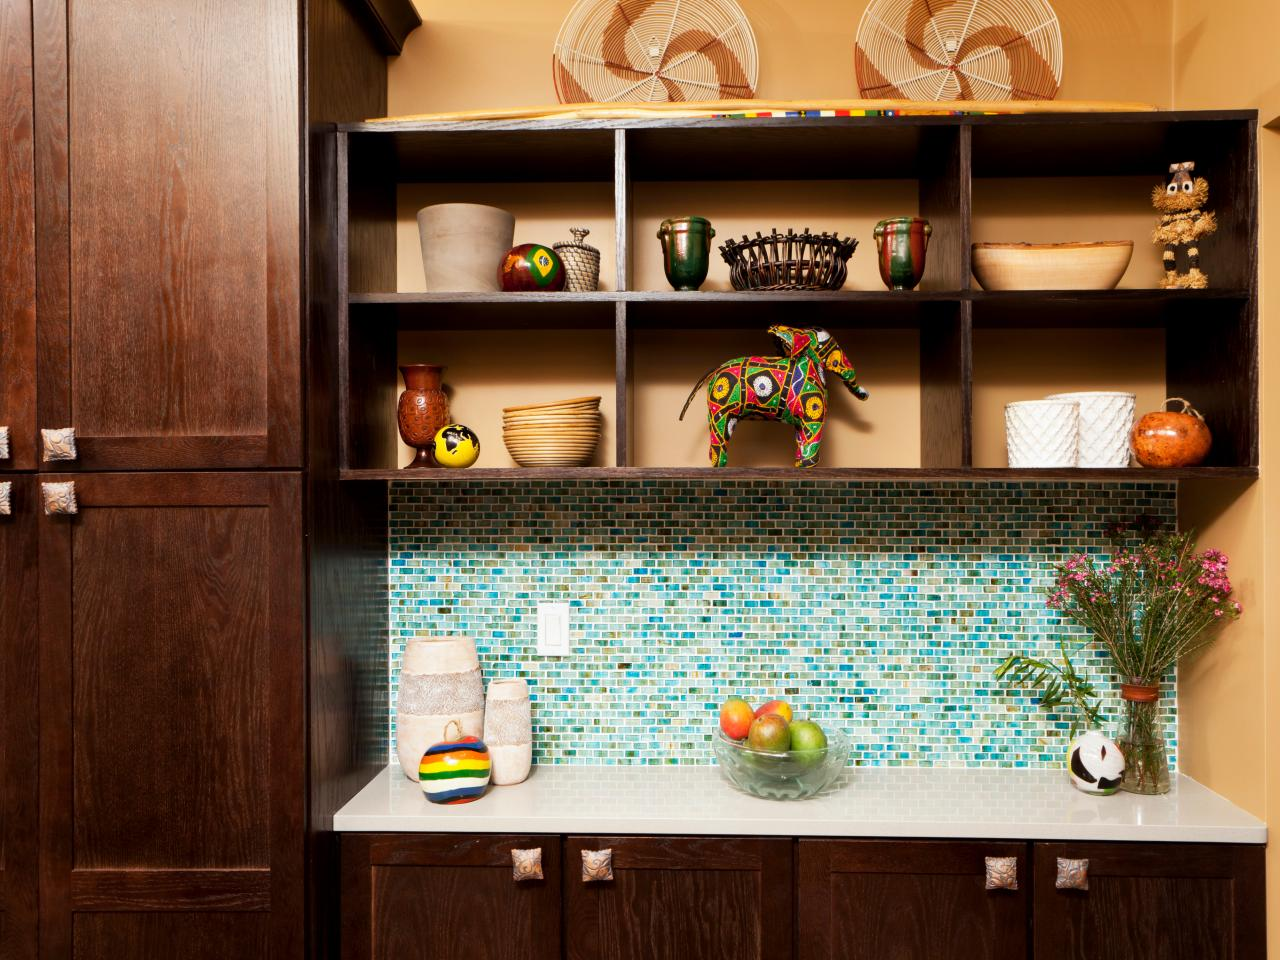 Cottage Kitchen Backsplash Ideas Part - 42: Contemporary Kitchen With Island Seating